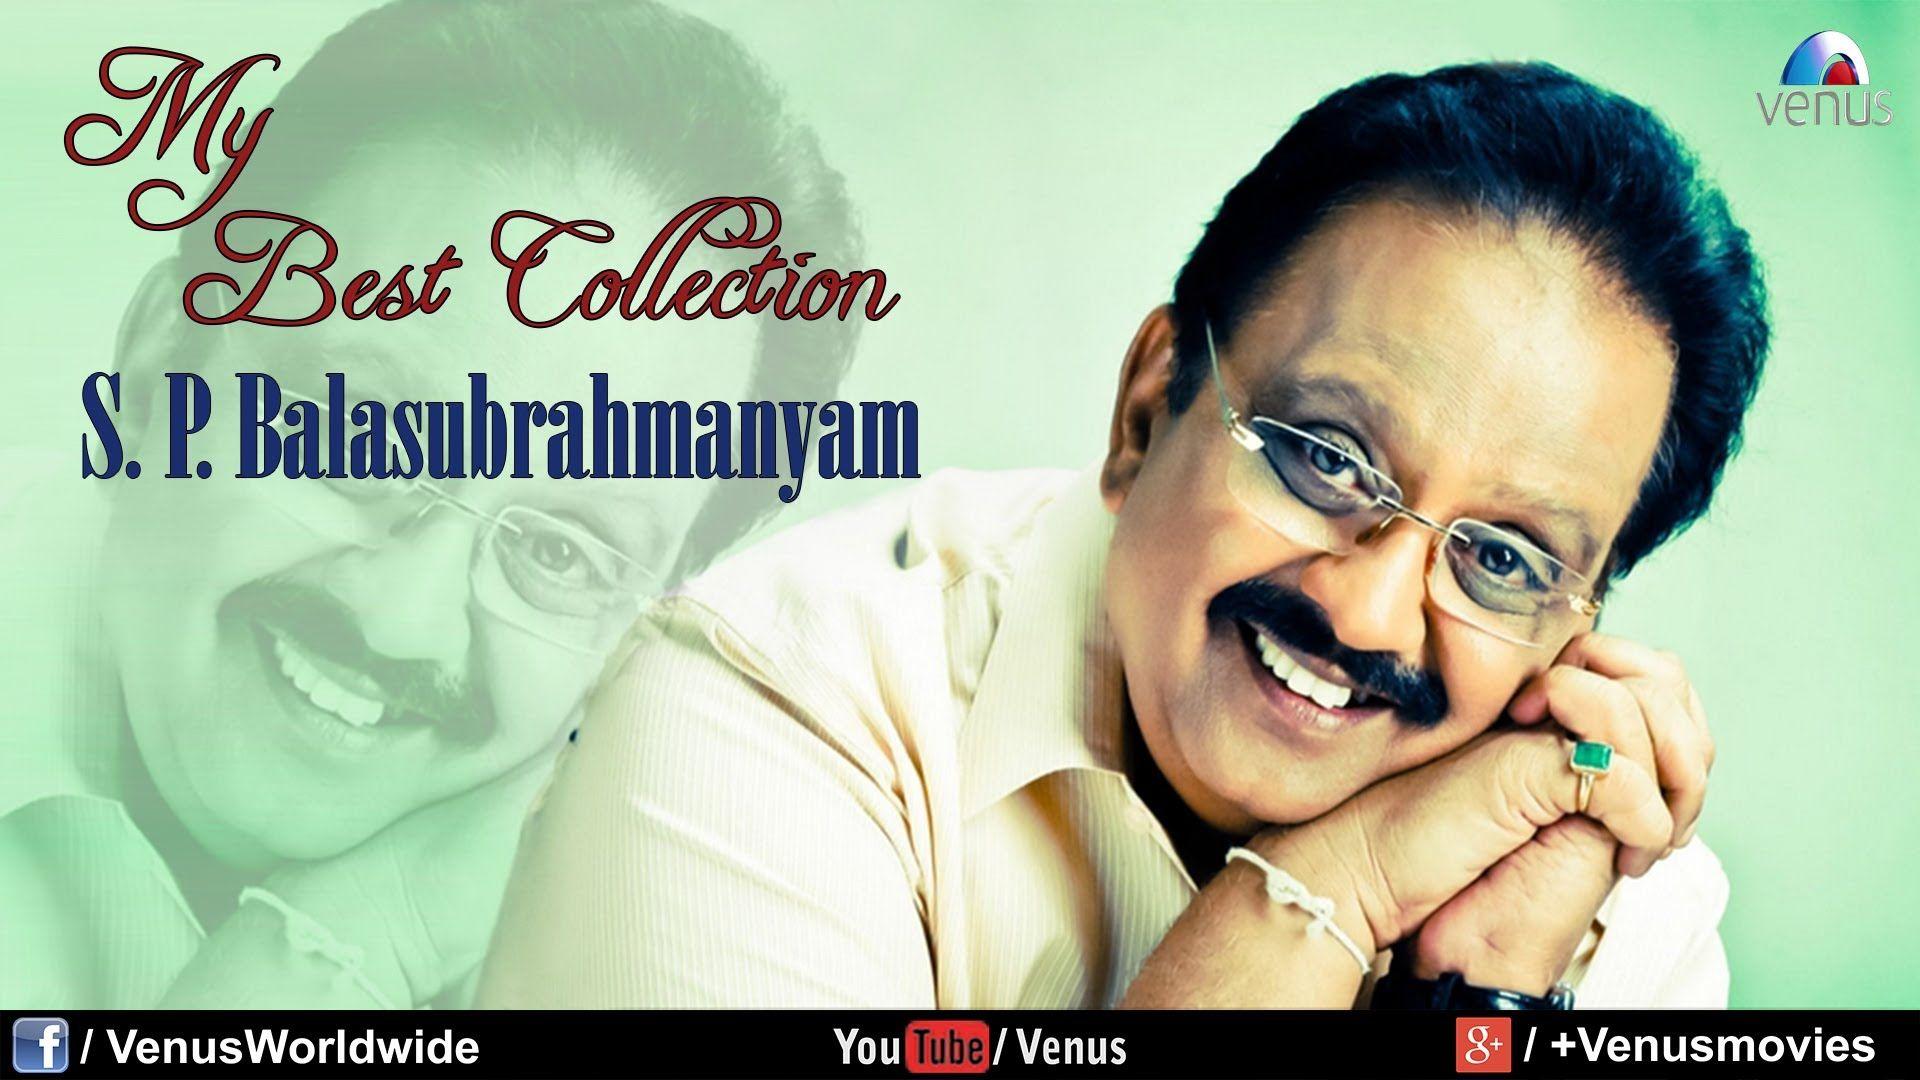 S P Balasubramaniam My Best Collection Audio Jukebox Jukebox Hindi Movie Song Song Hindi